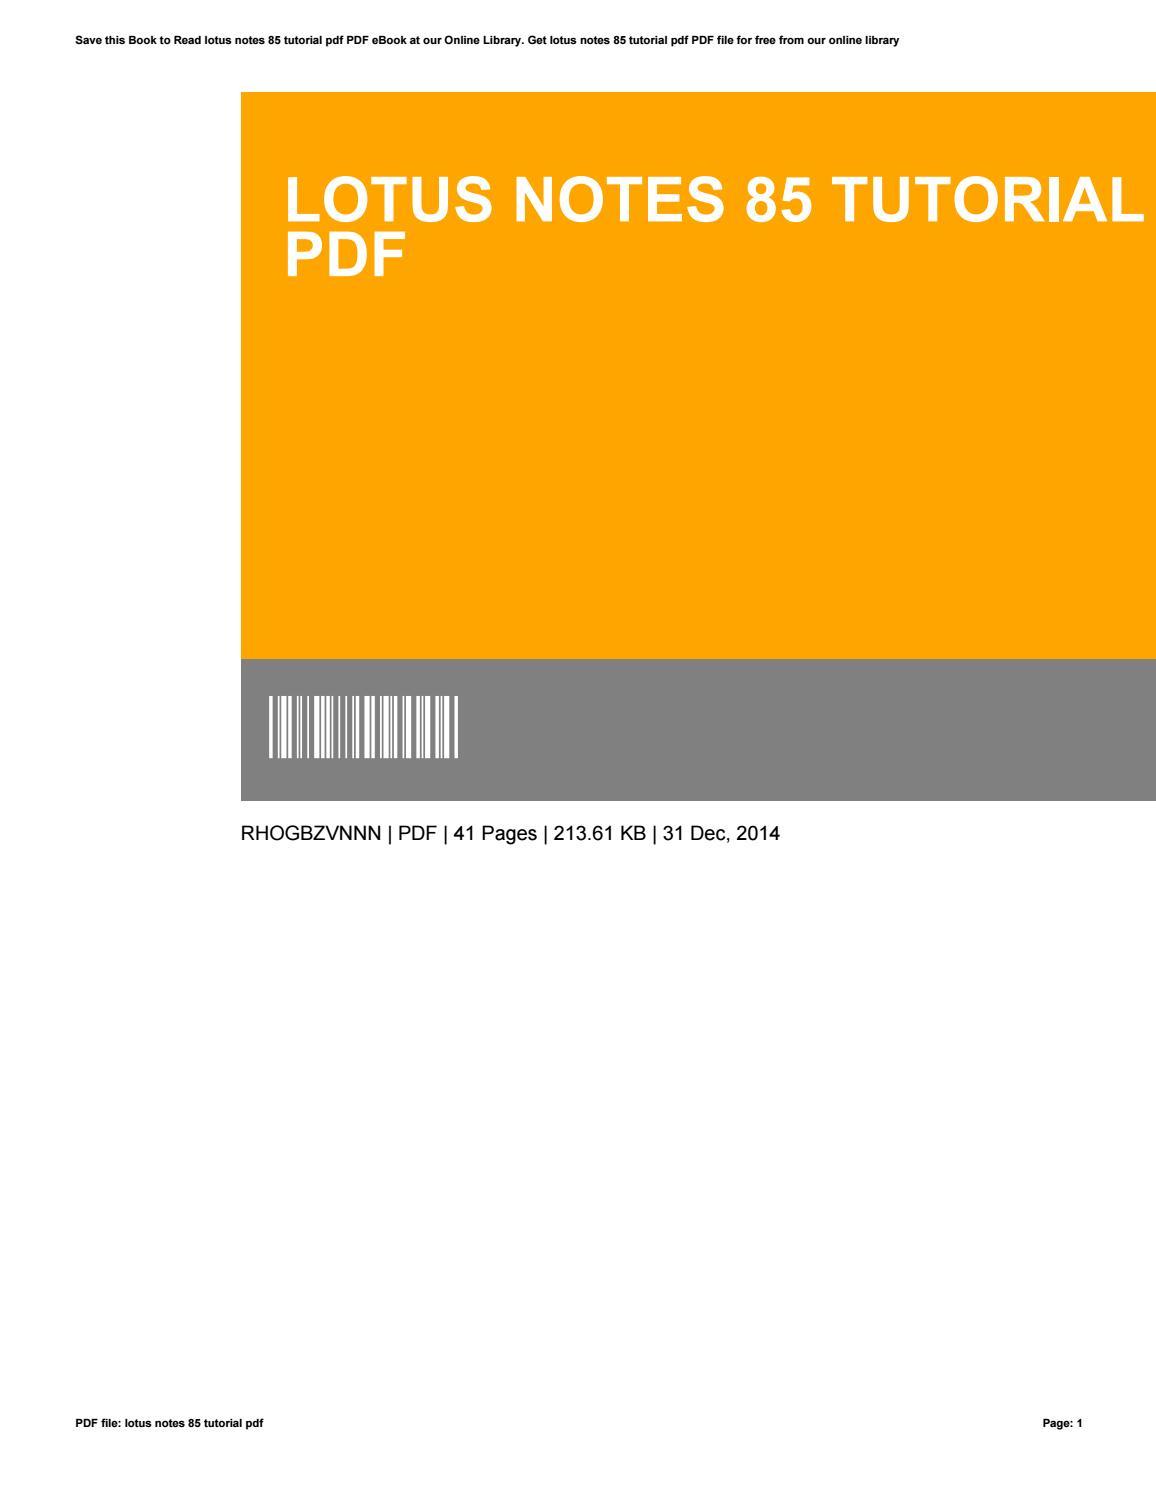 lotus notes 85 tutorial pdf by steve landrum - issuu